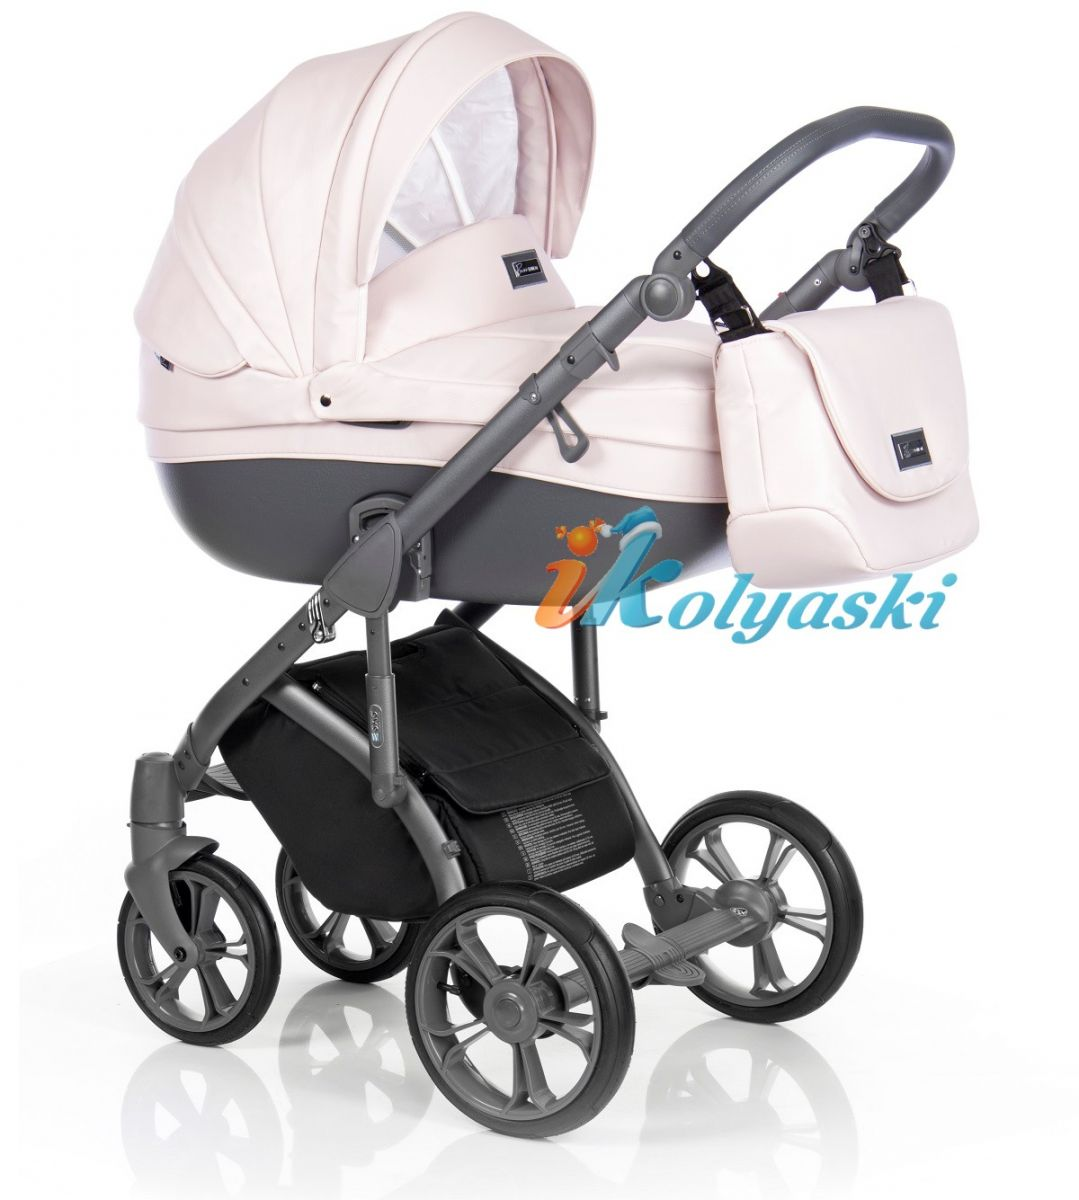 Roan Bass Soft Romantic Pink NEW Eco-Leather коляска для новорожденных новинка